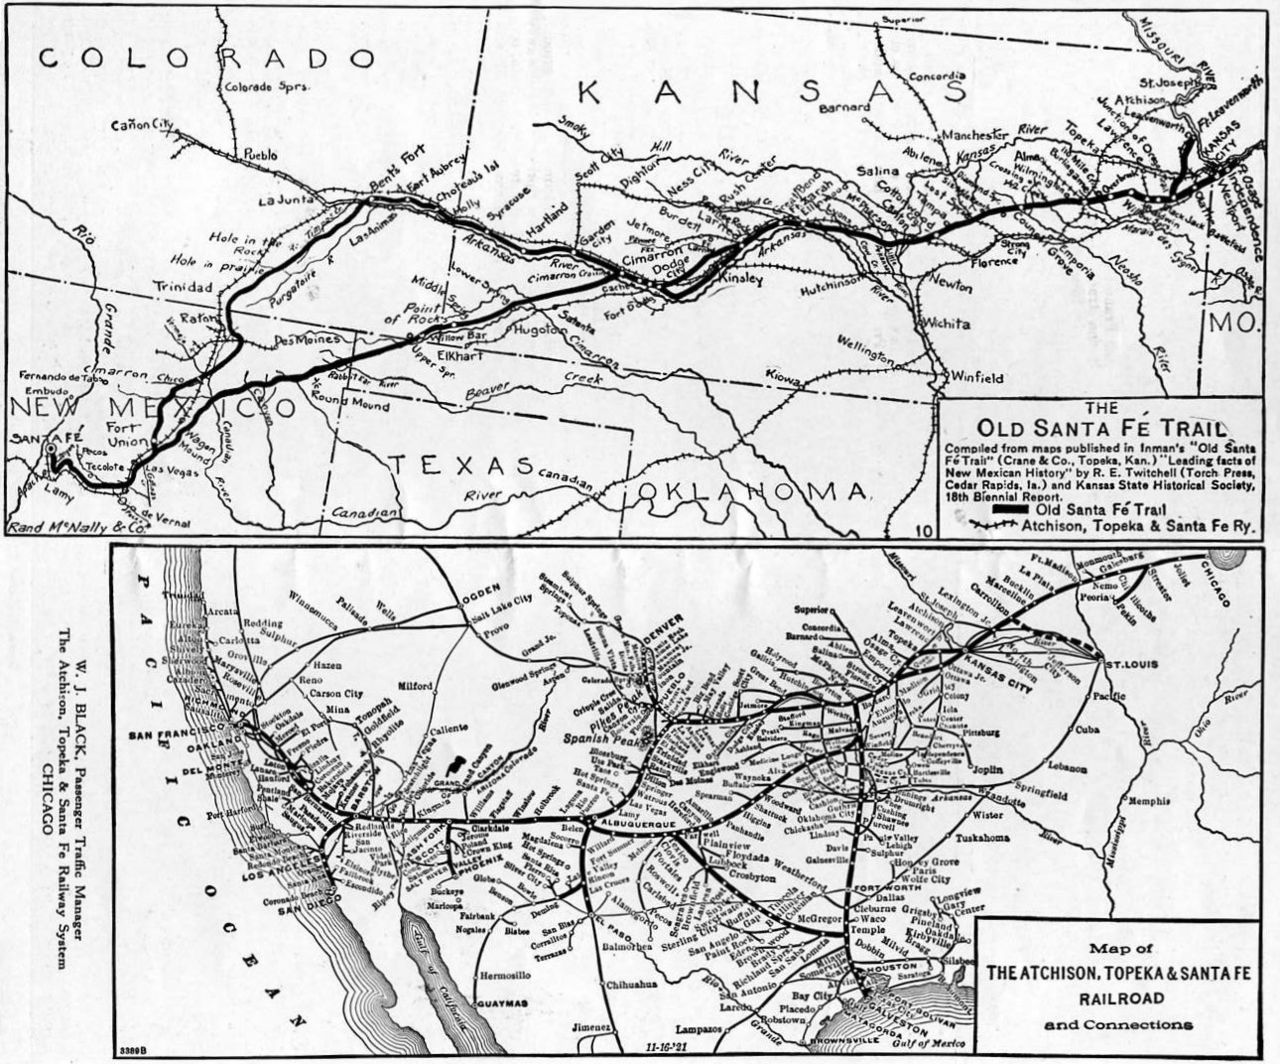 http://upload.wikimedia.org/wikipedia/commons/thumb/1/1d/Santa_Fe_Trail_and_Railroad_map%2C_1922.jpg/1280px-Santa_Fe_Trail_and_Railroad_map%2C_1922.jpg